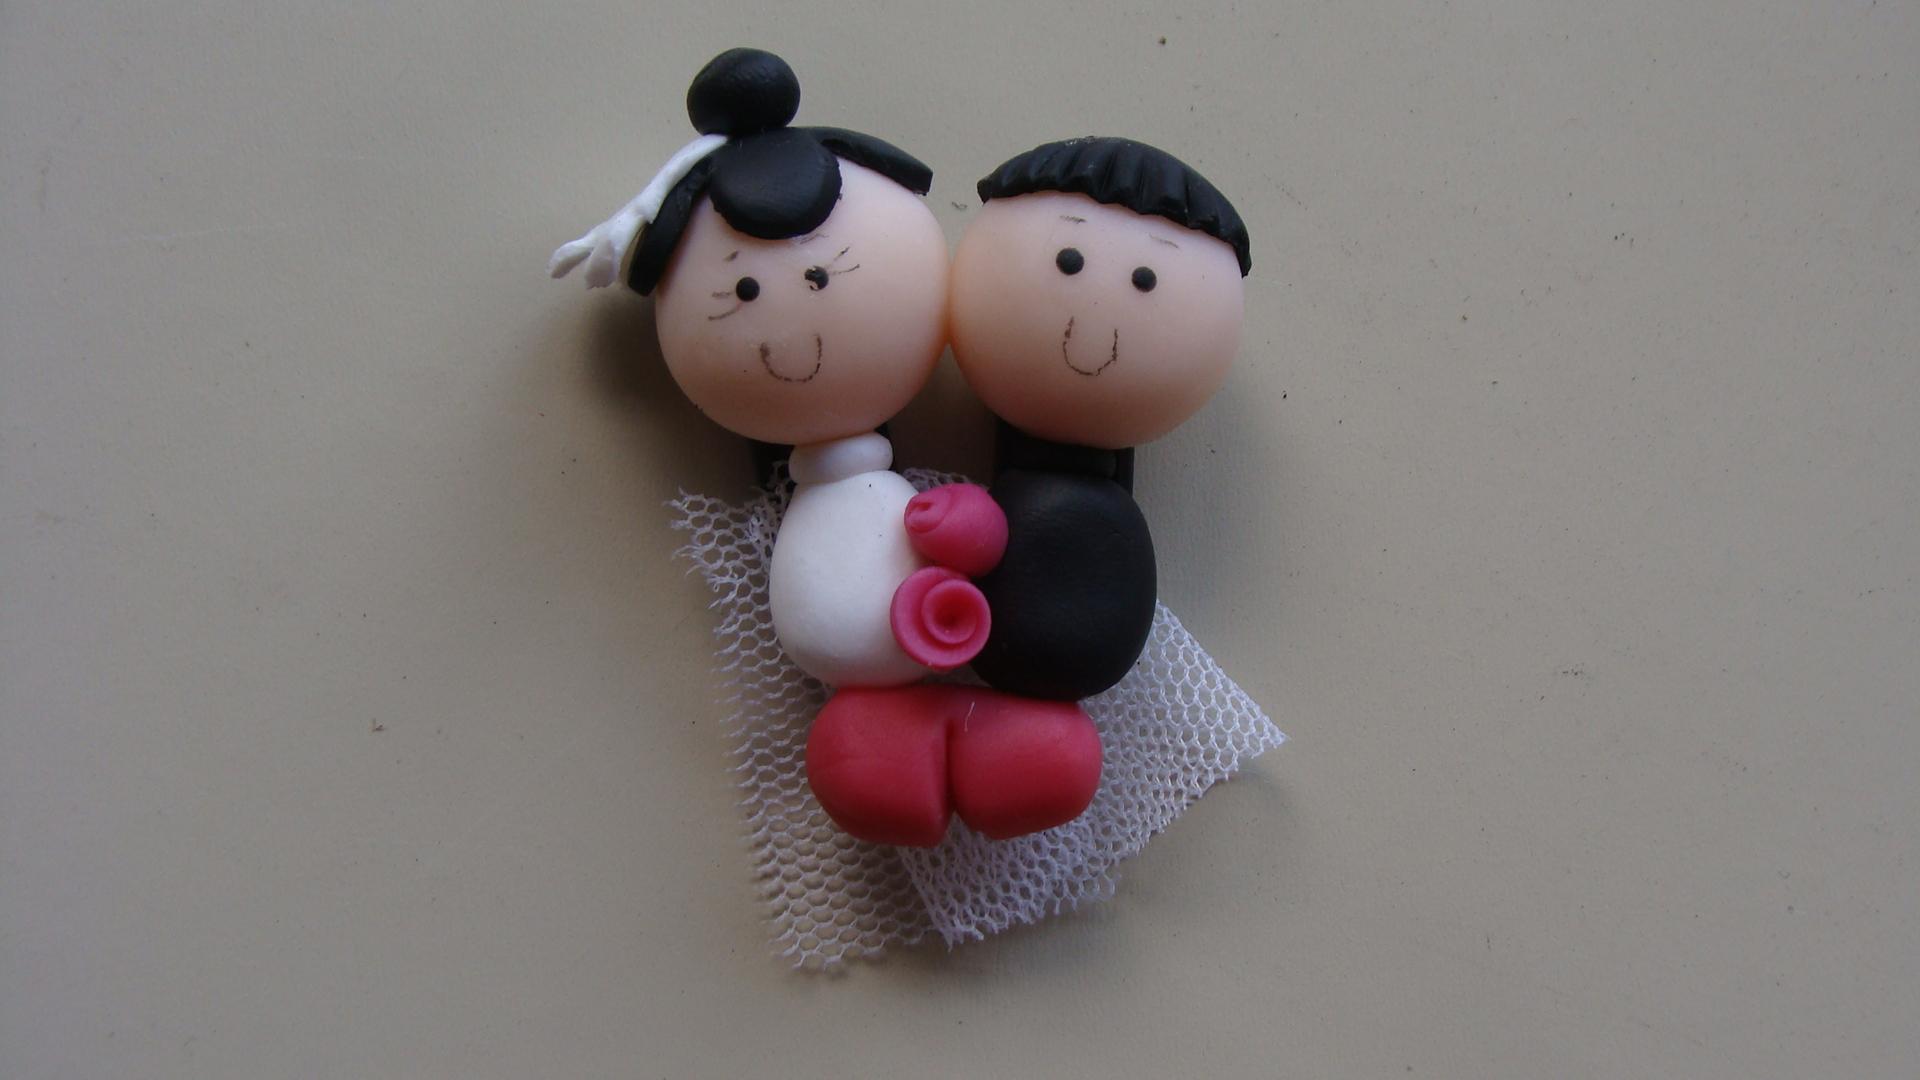 lembrancinha 10 casal de biscuit - casamento, noivado. Carregando zoom.